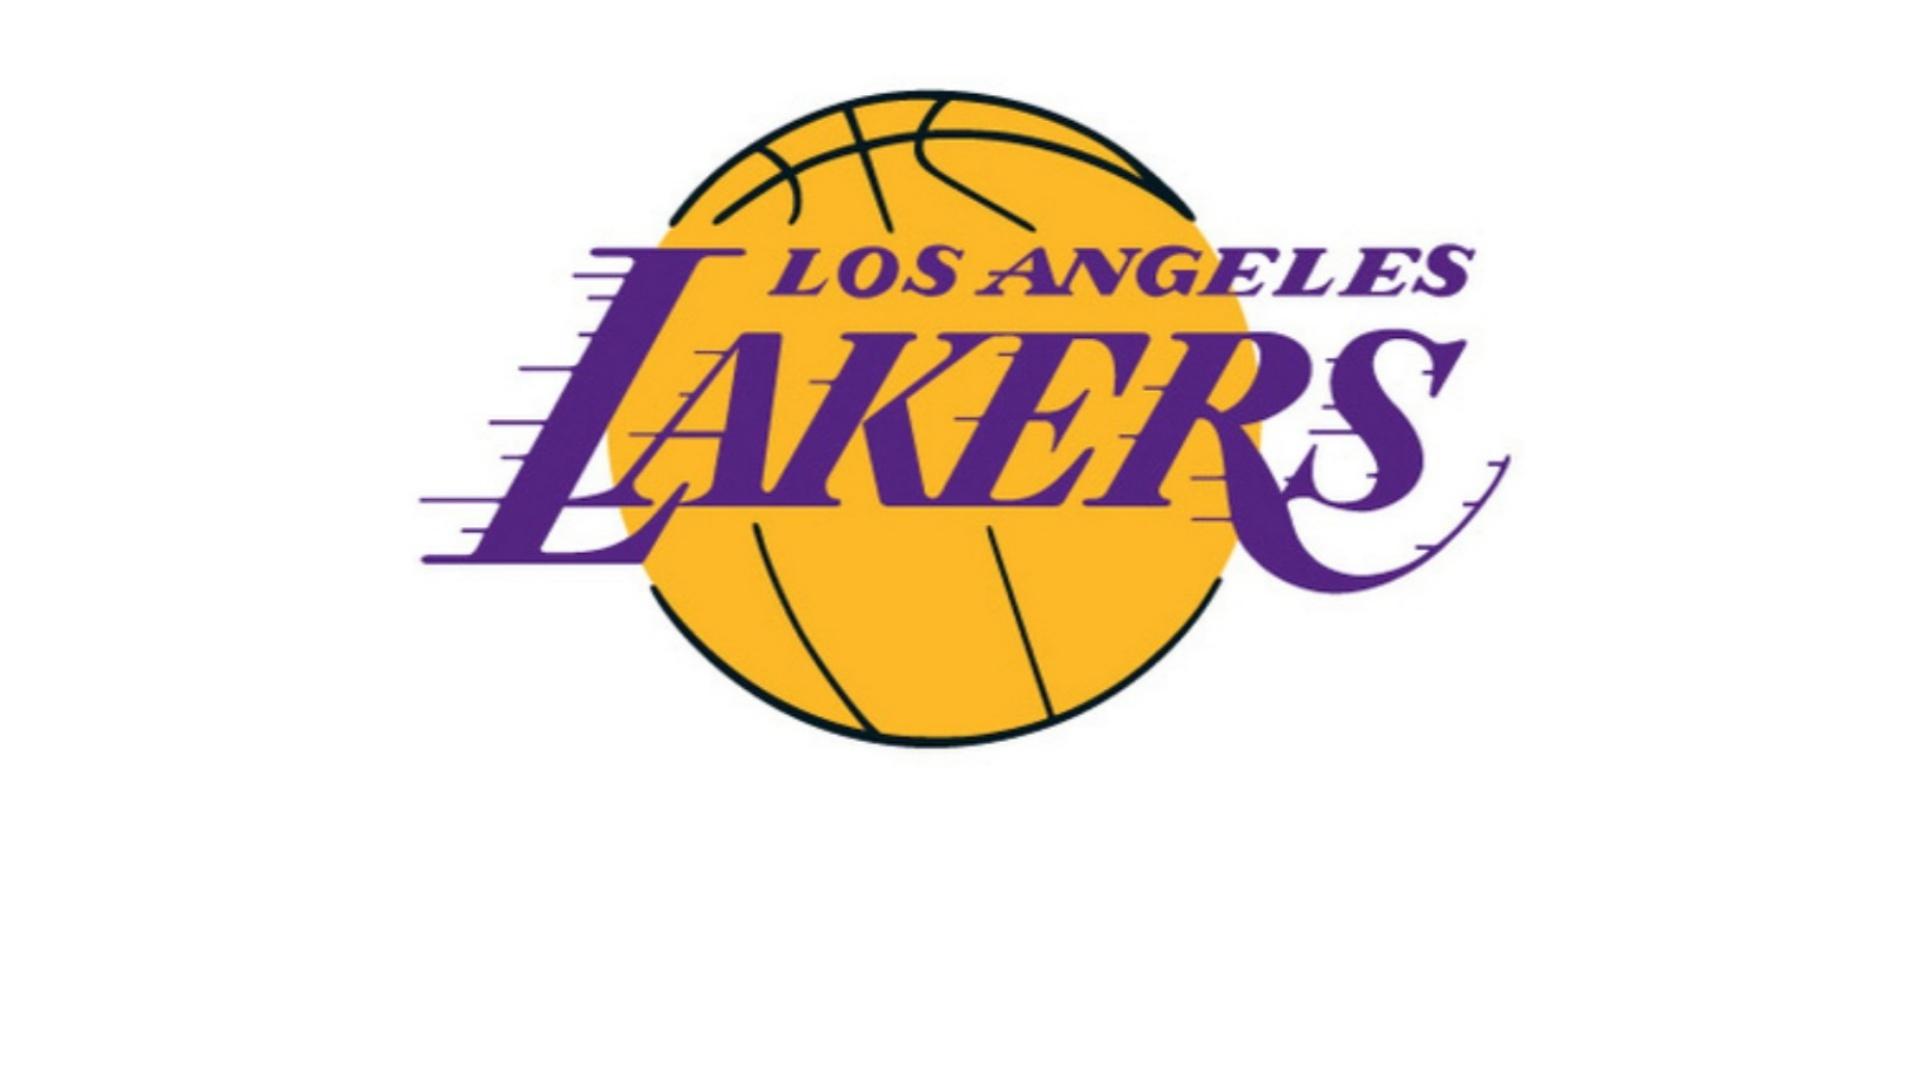 New York Knicks vs Los Angeles Lakers preview, TV telecast